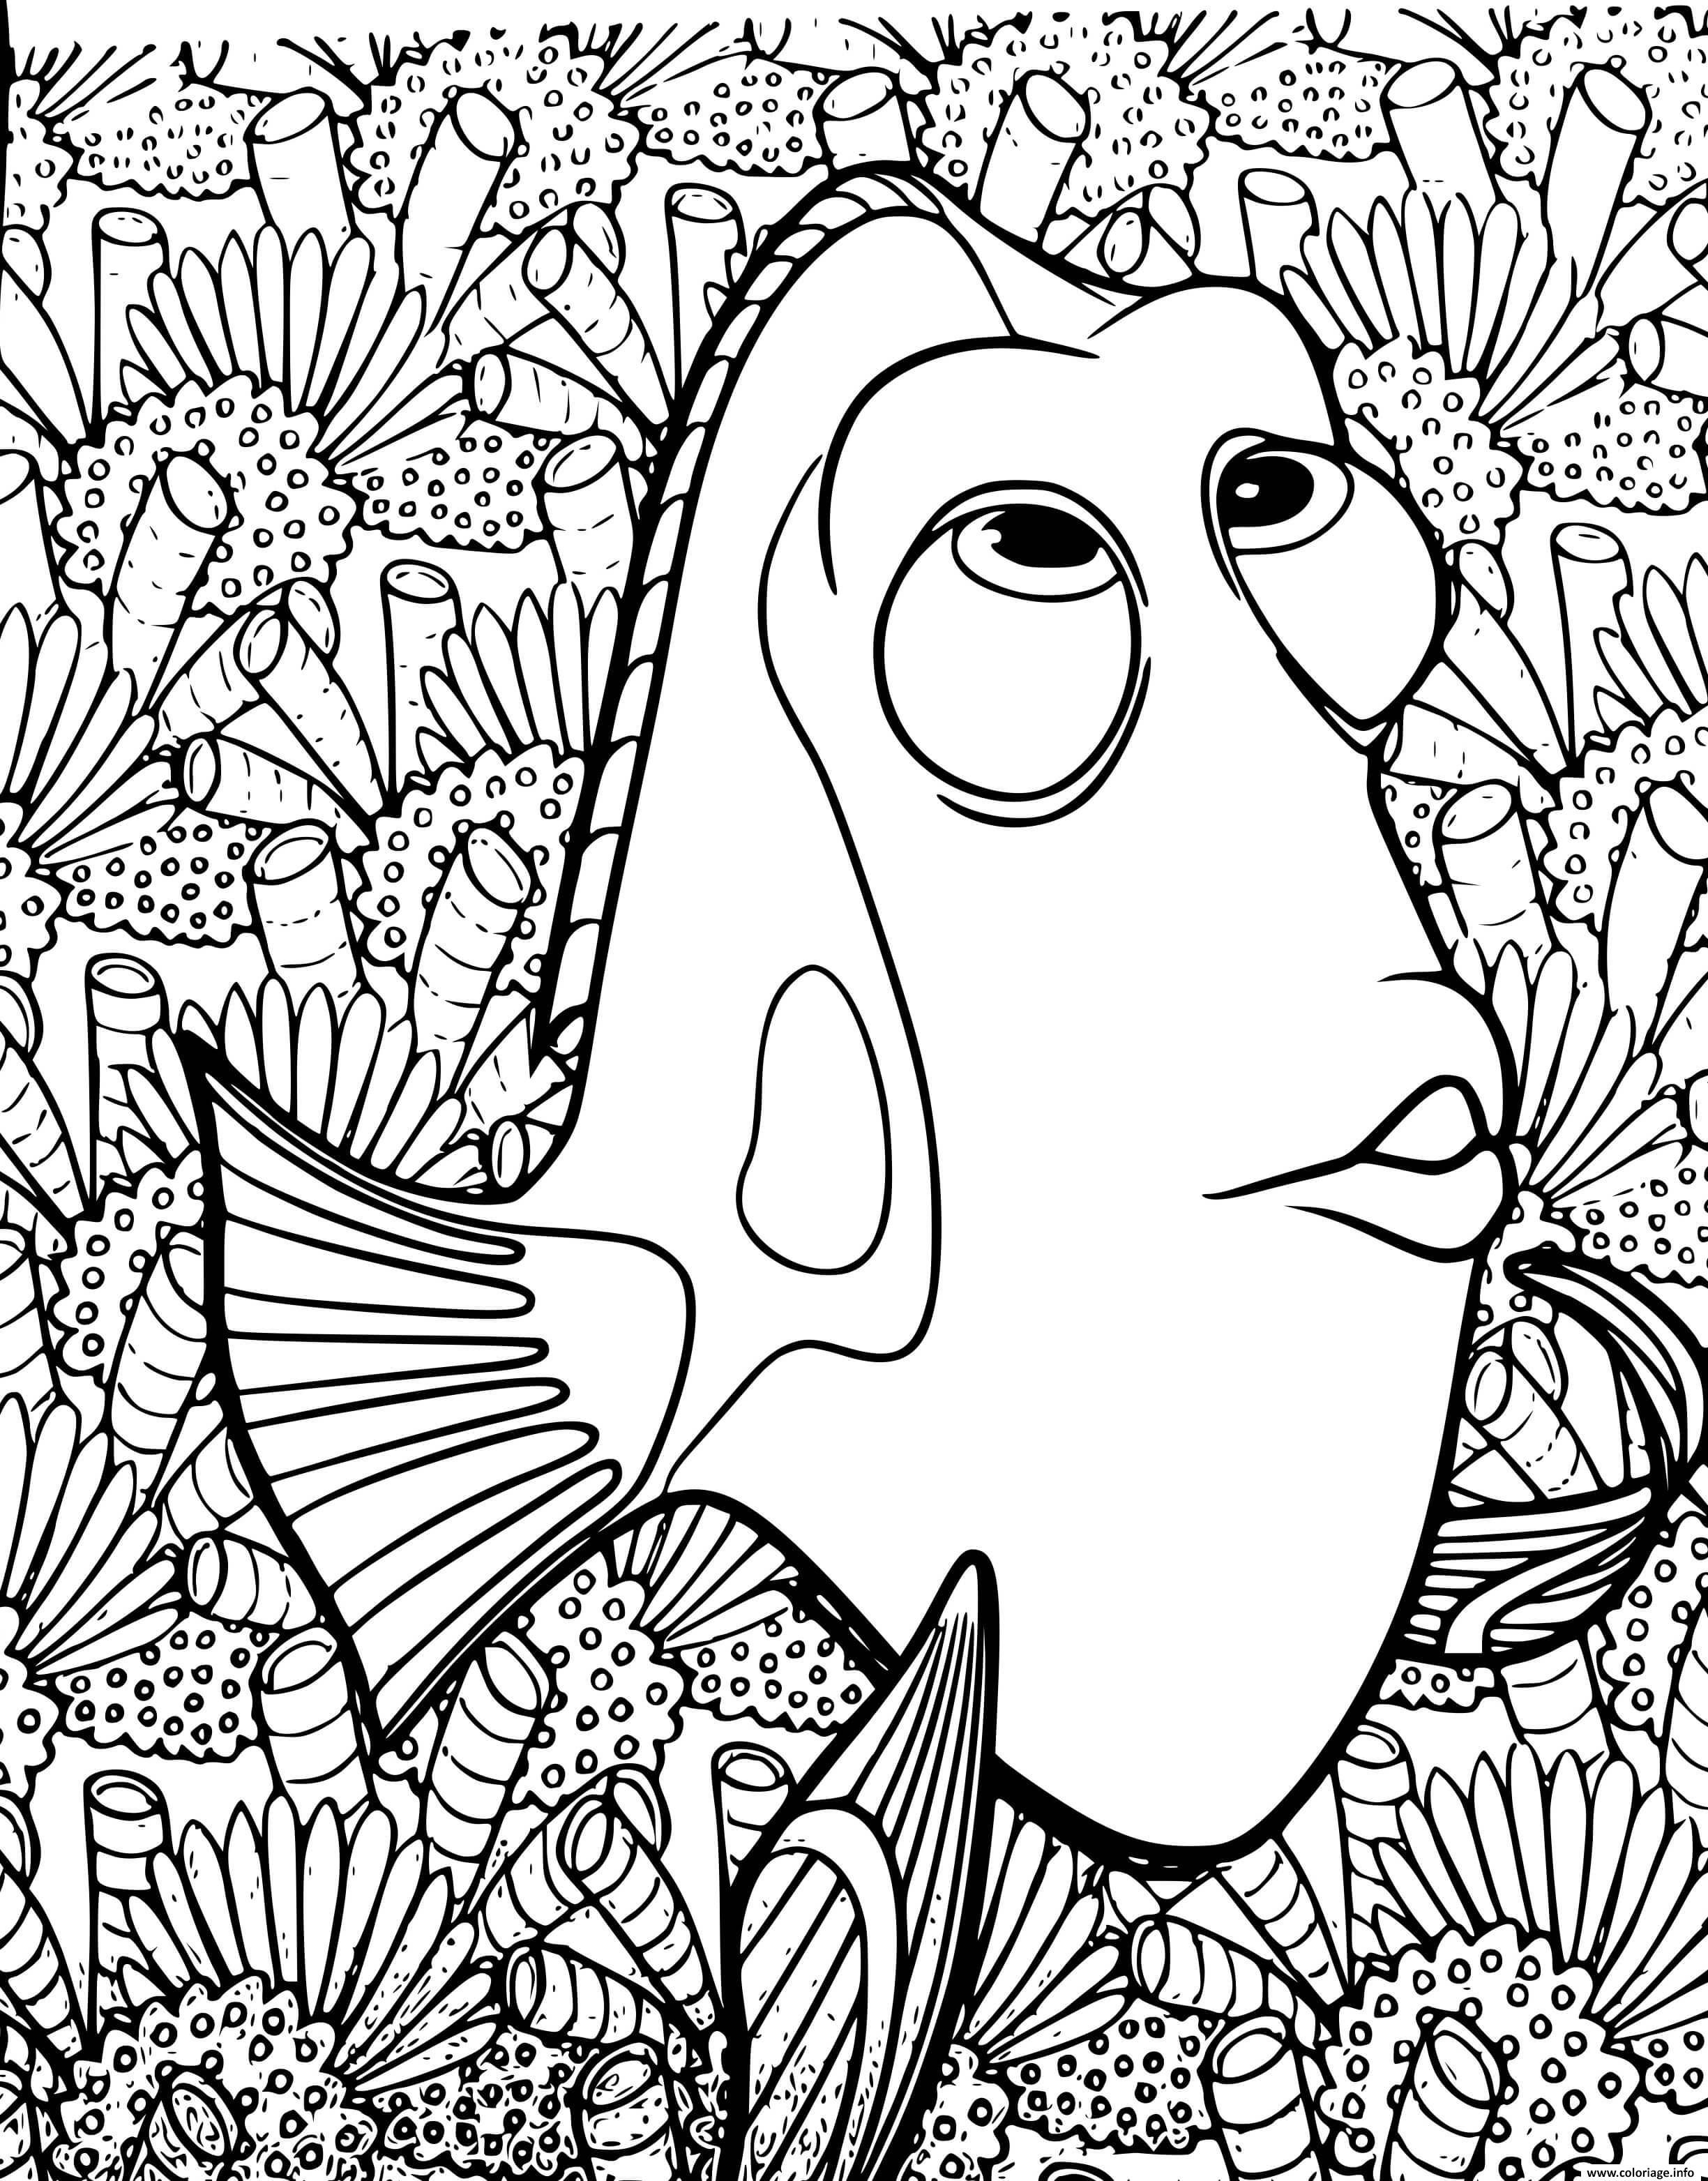 Dessin dory cherche Nemo Coloriage Gratuit à Imprimer